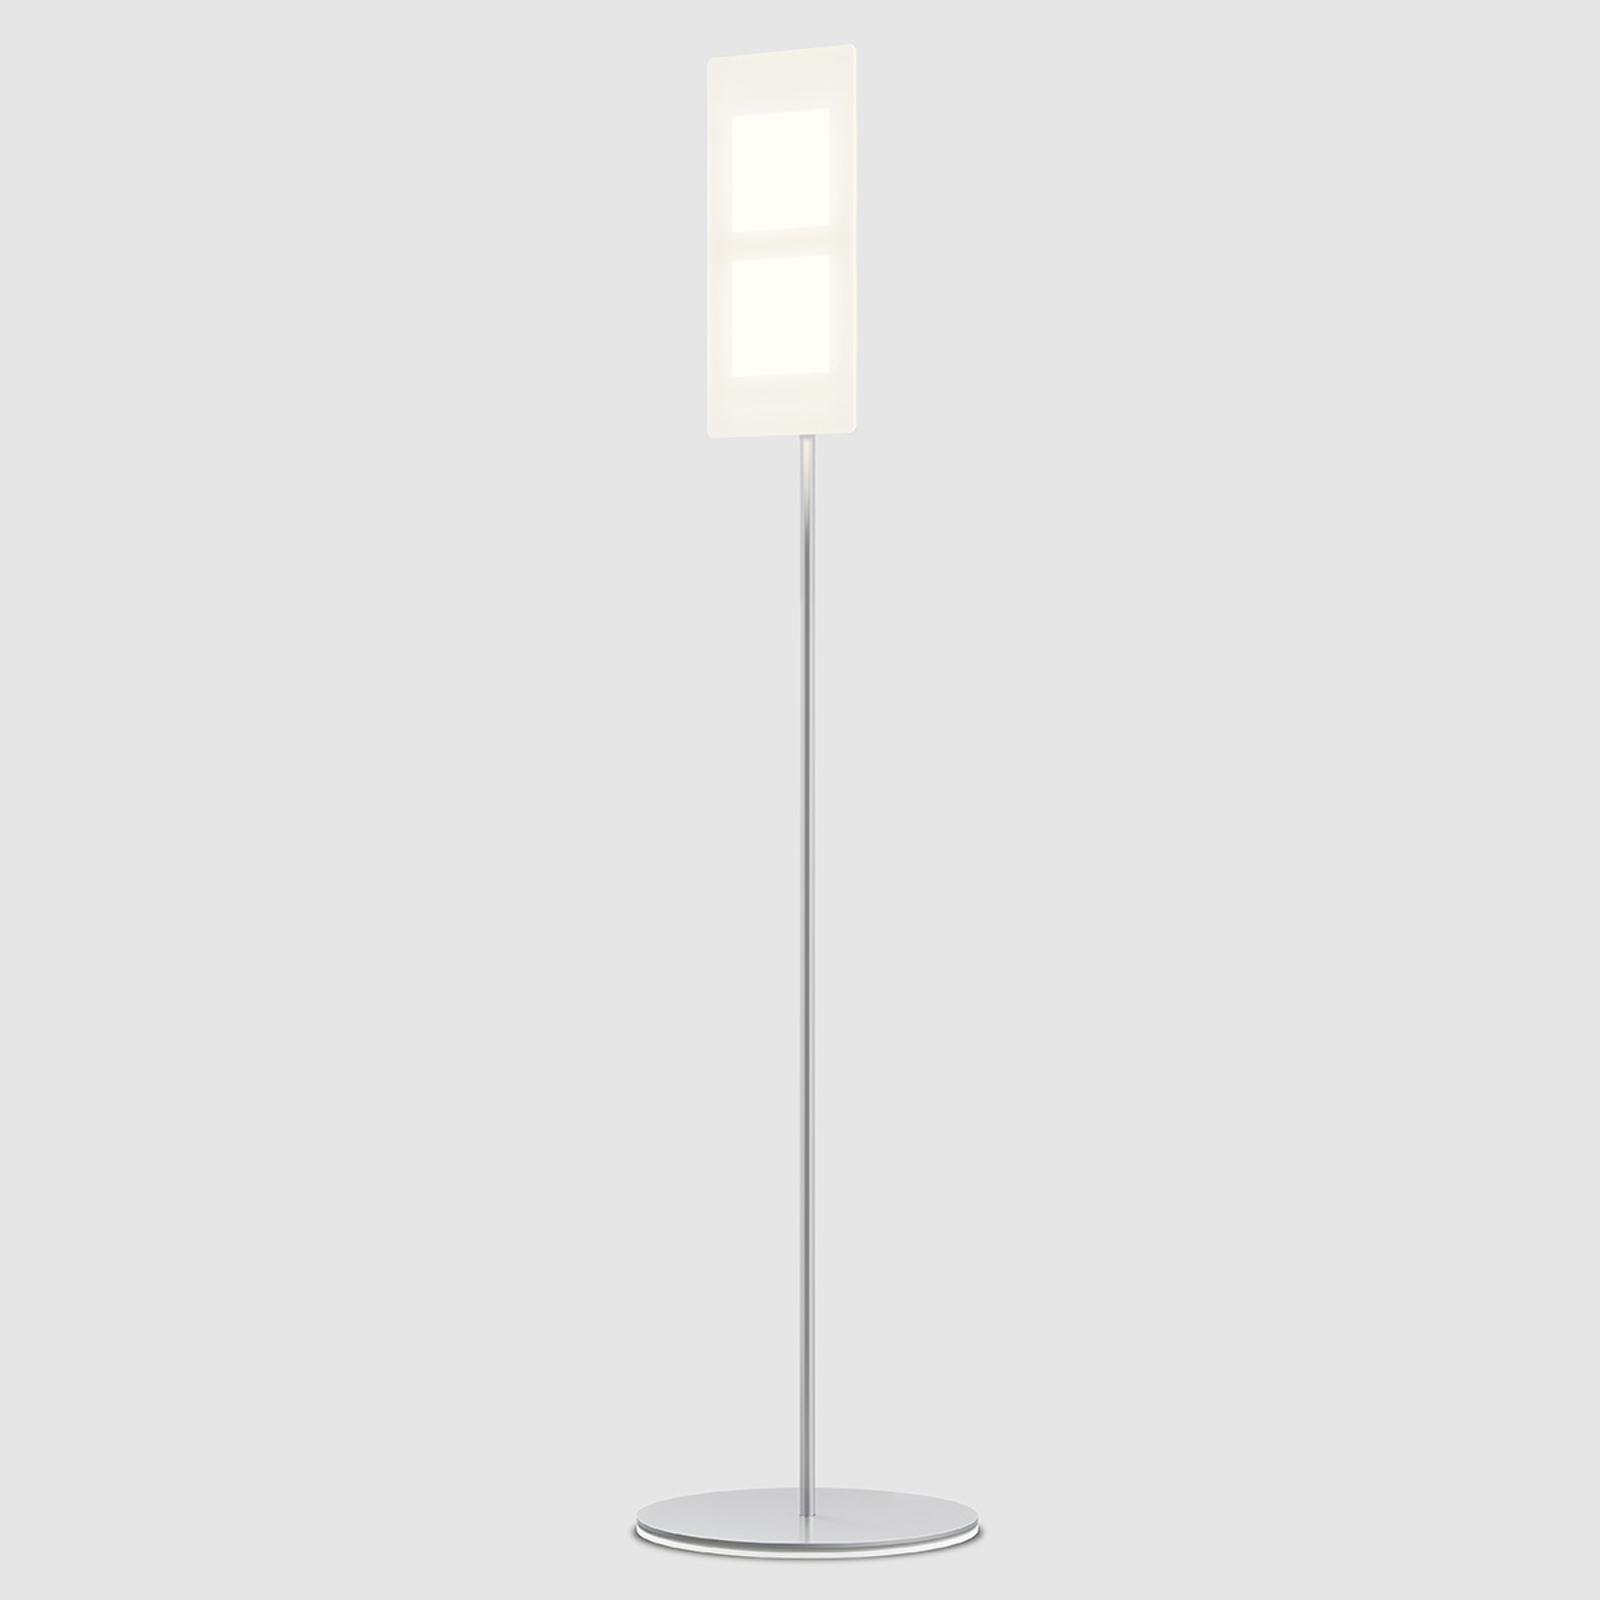 Acquista Con OLED - lampada da terra OMLED One f2